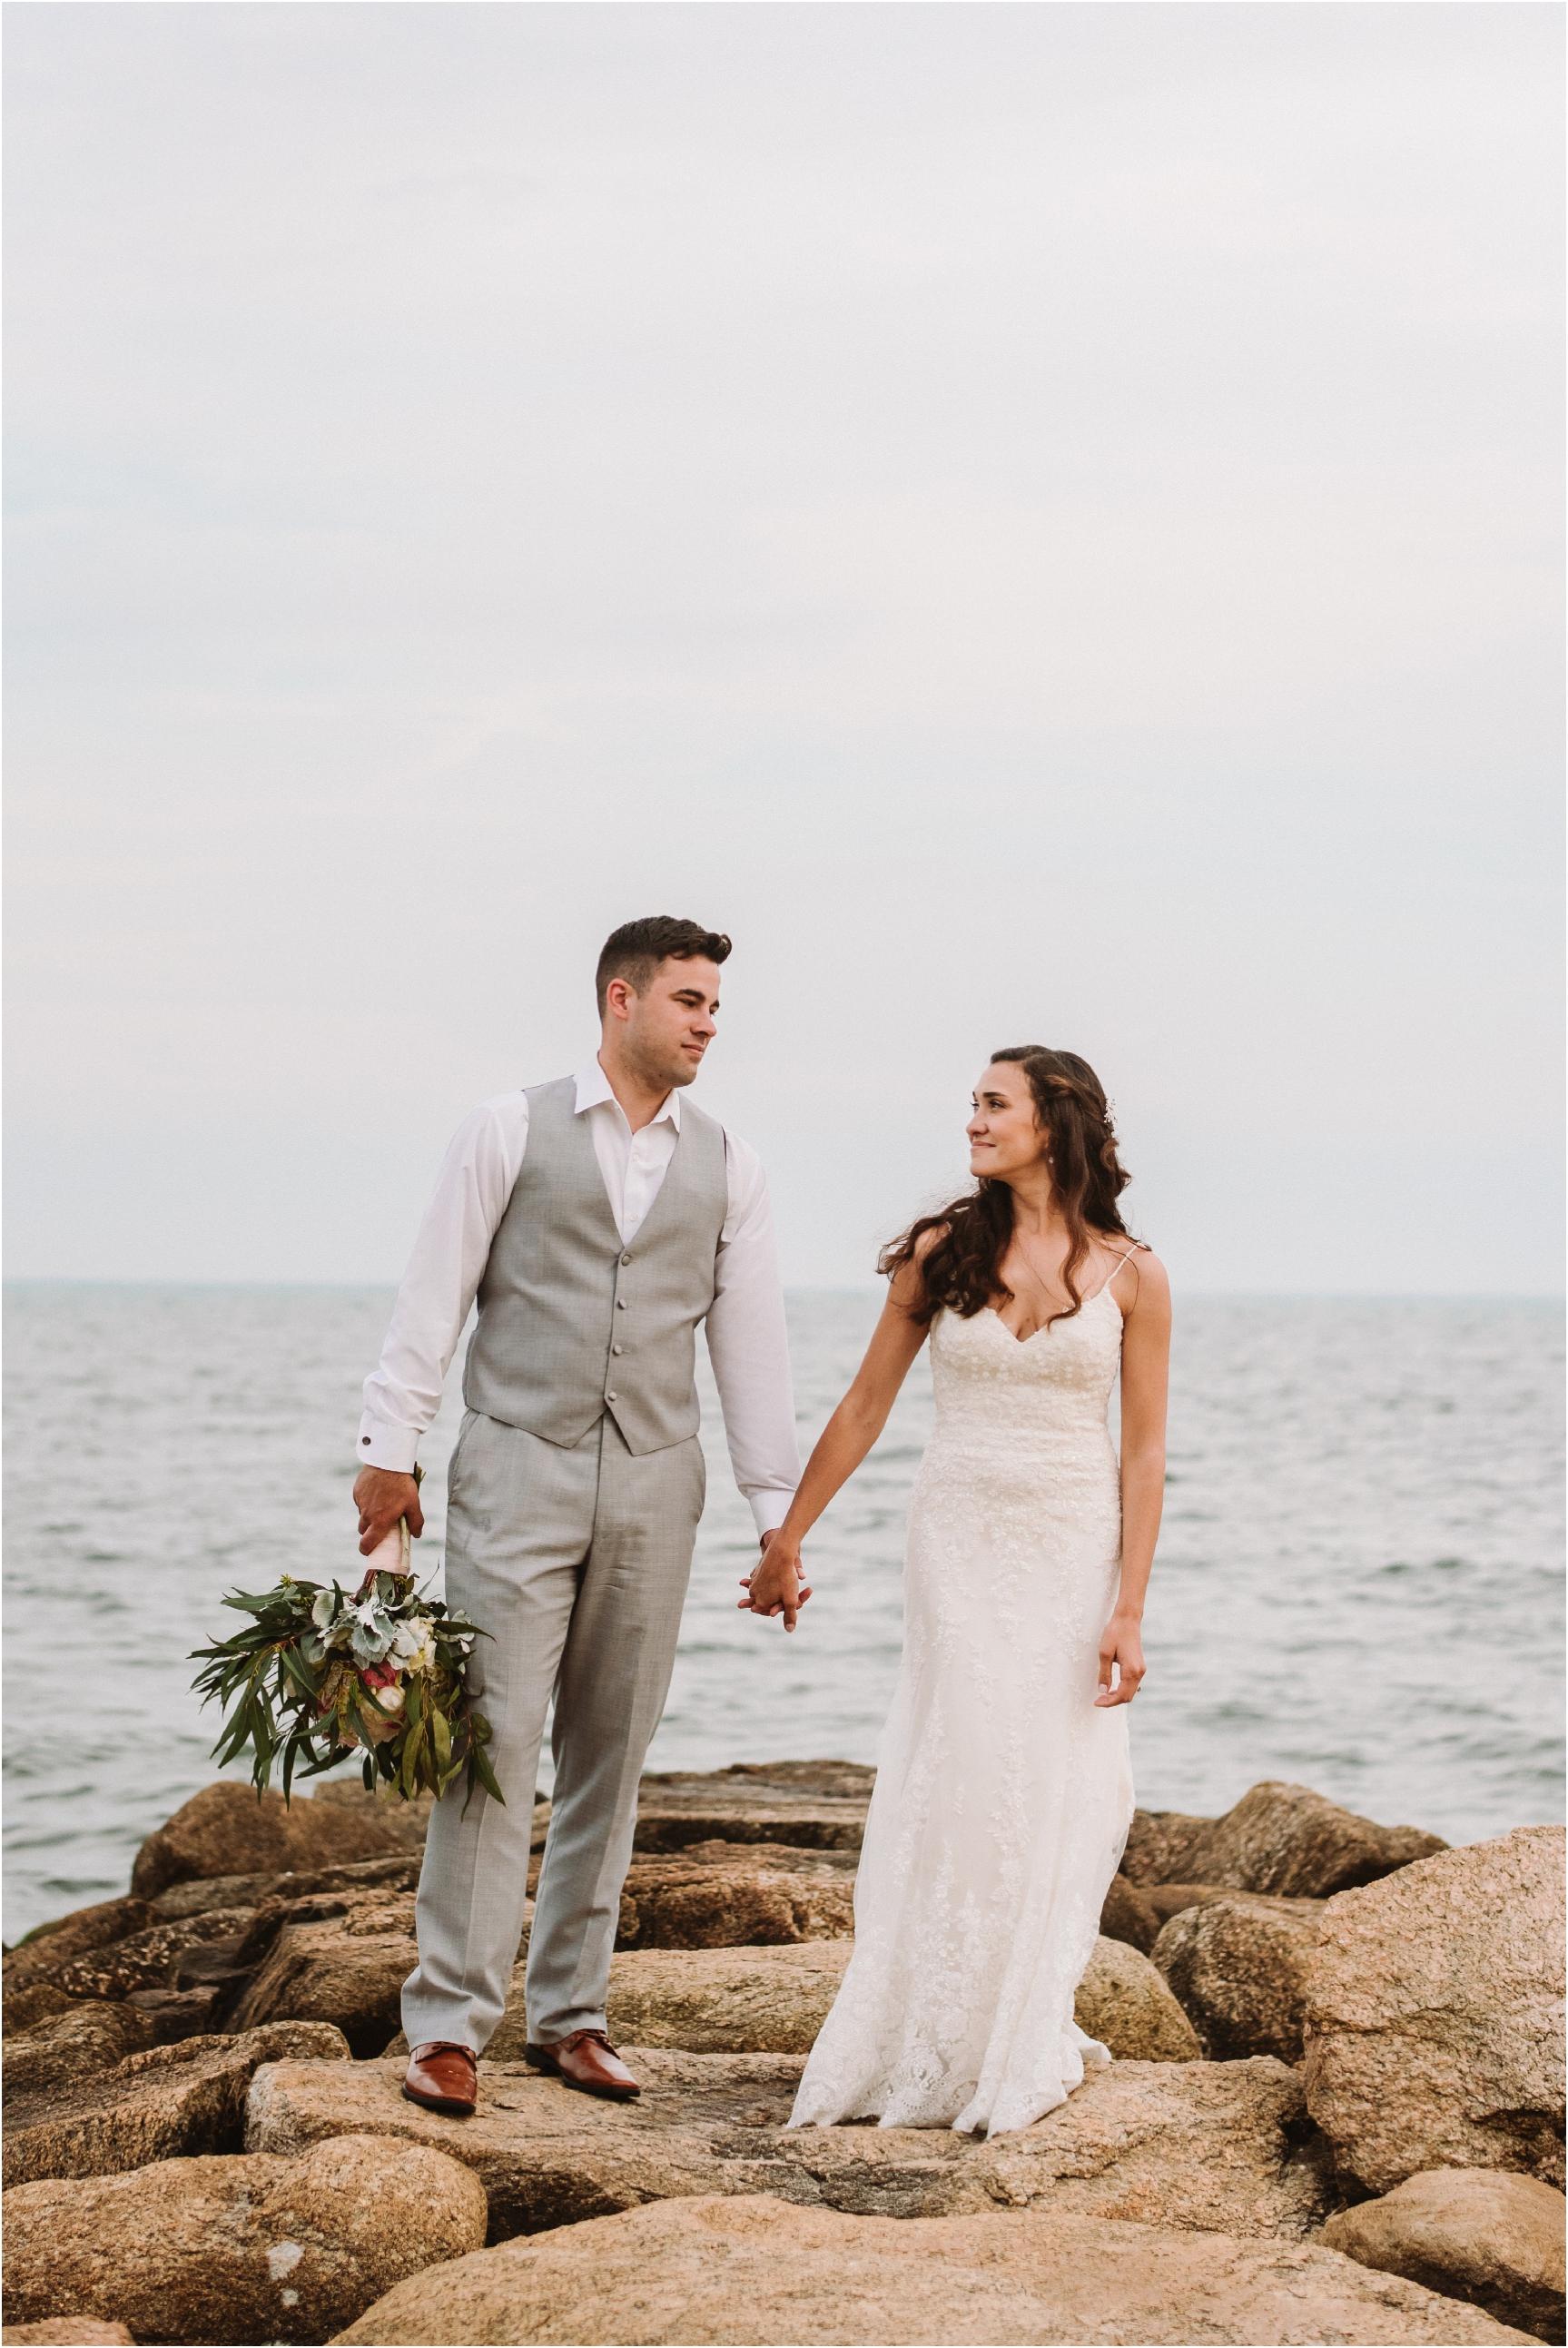 Sarah & Sam Pelham House Cape Cod Wedding Photographer-183.jpg